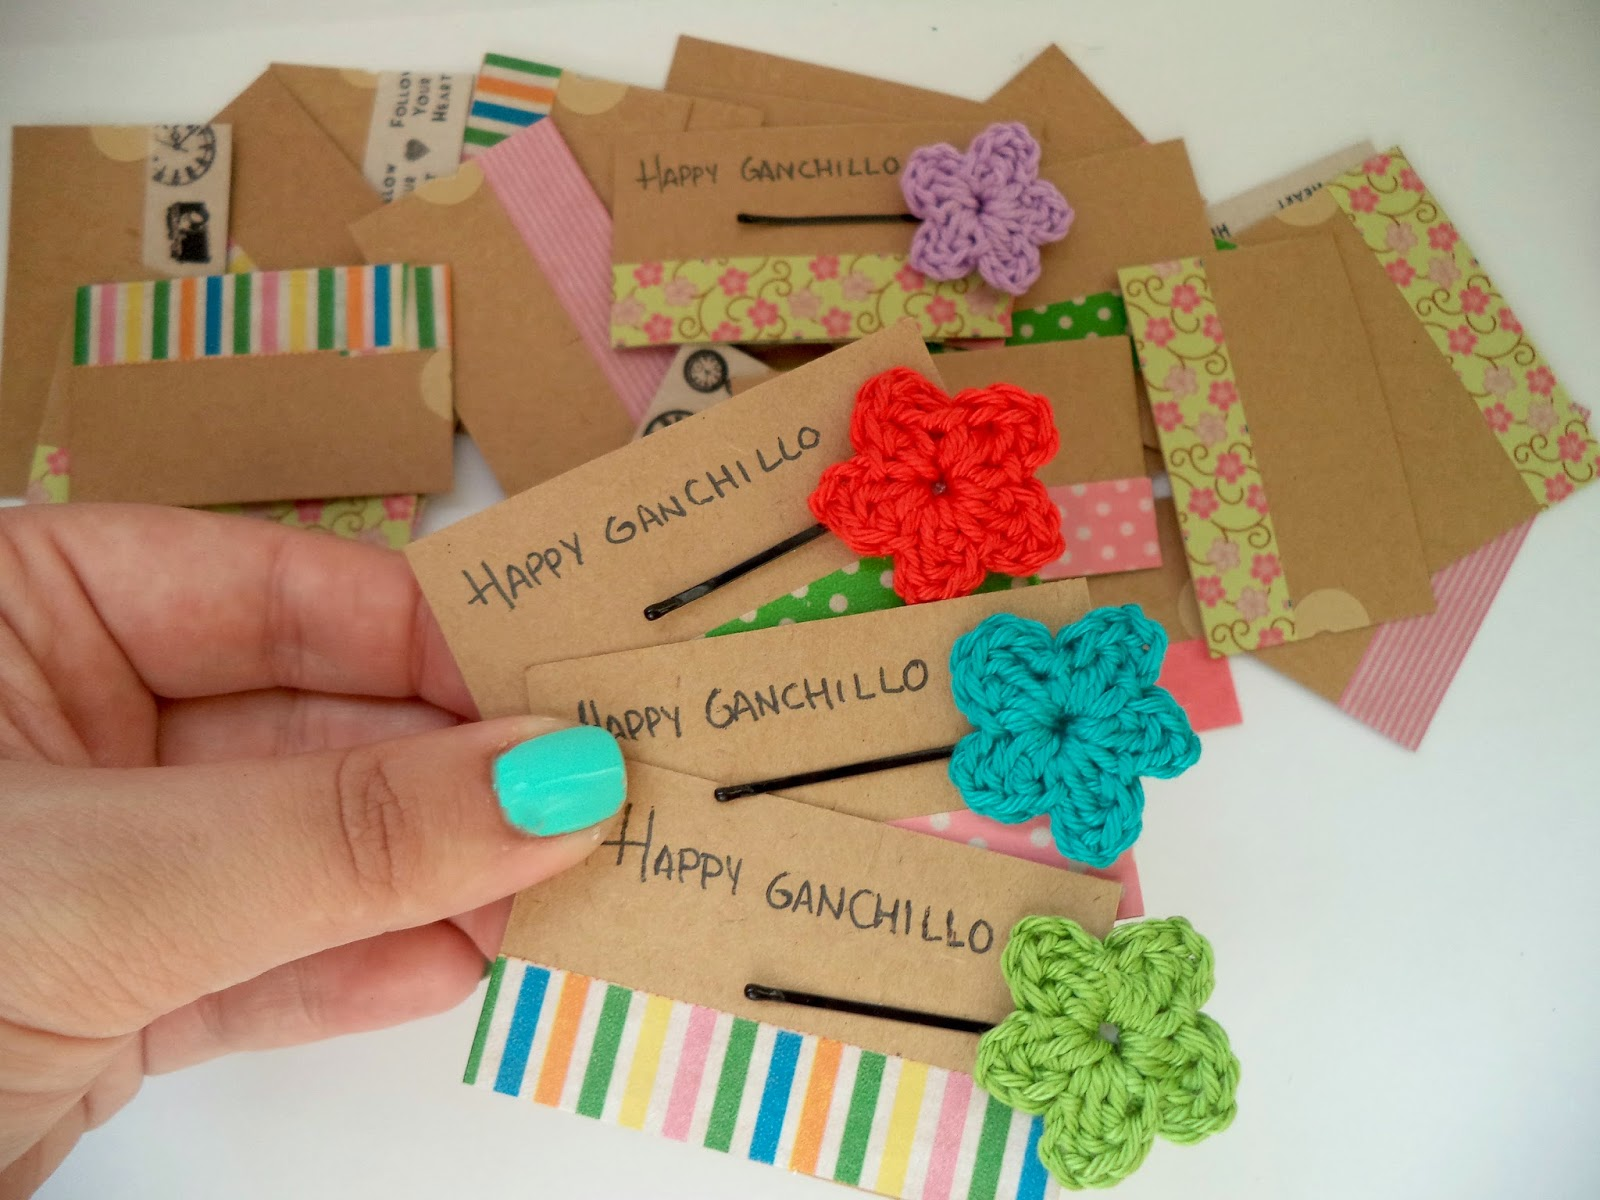 tarjetas de visita DIY